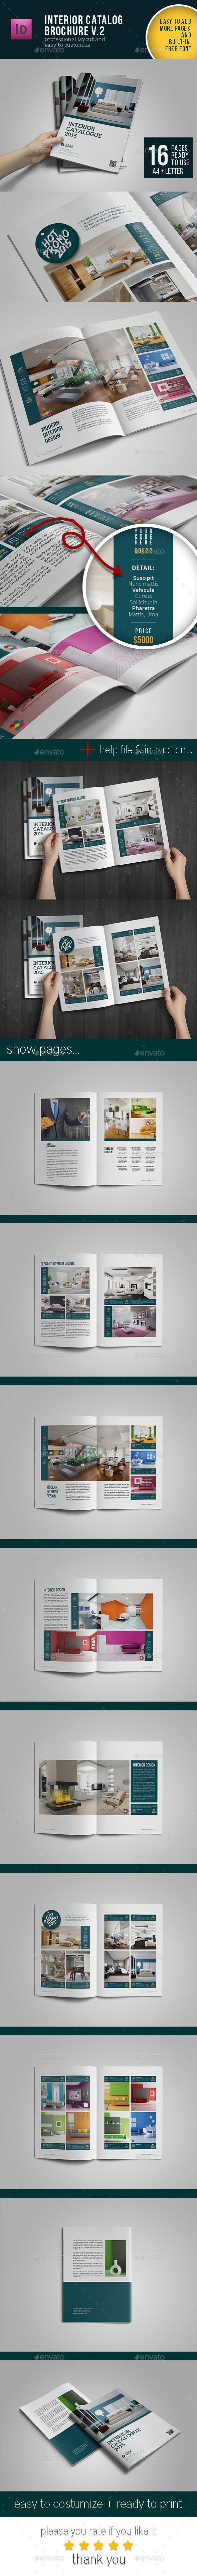 GraphicRiver Brochure Catalog Template Vol.2 10969640